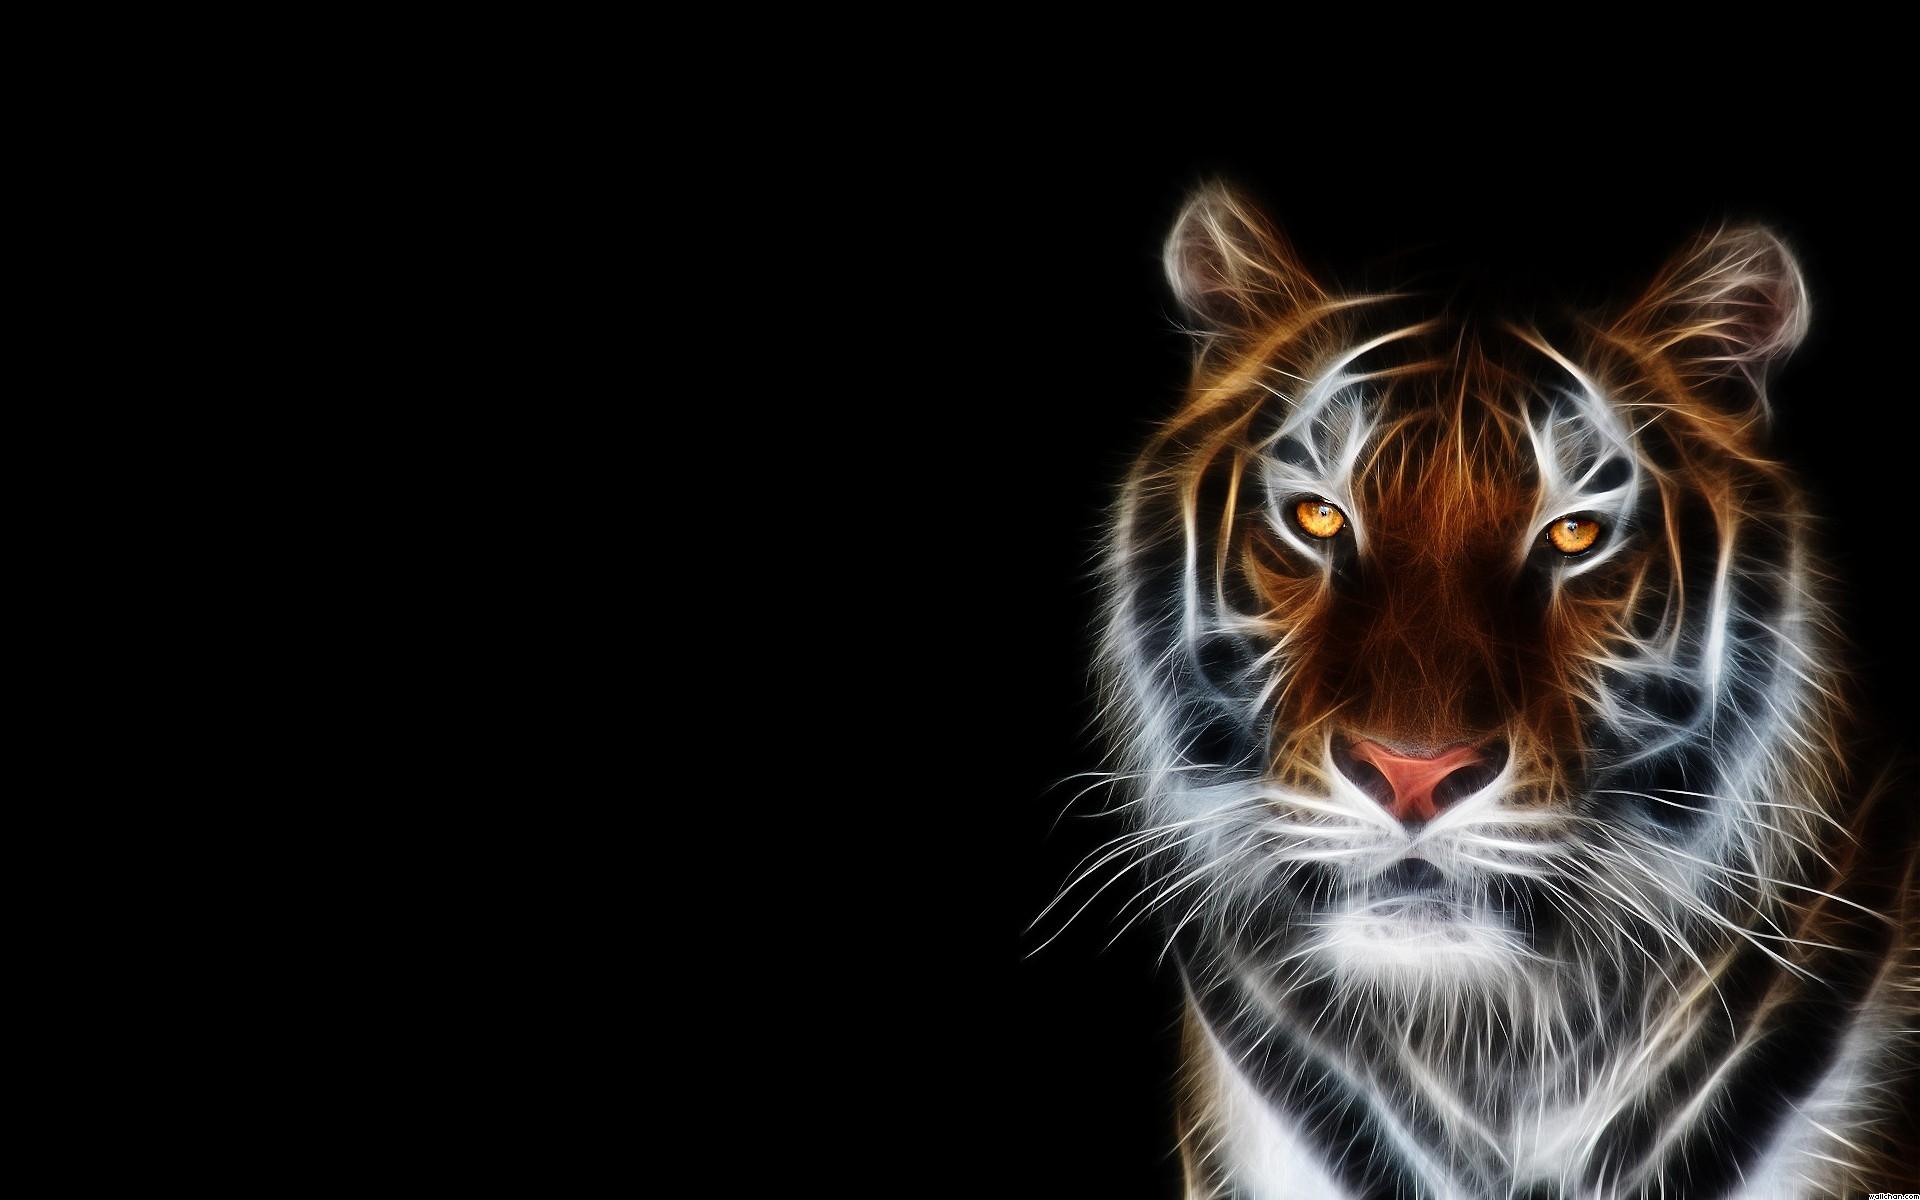 Beautiful Tiger Wallpaper Tiger Background Image Hd 1920x1200 Wallpaper Teahub Io